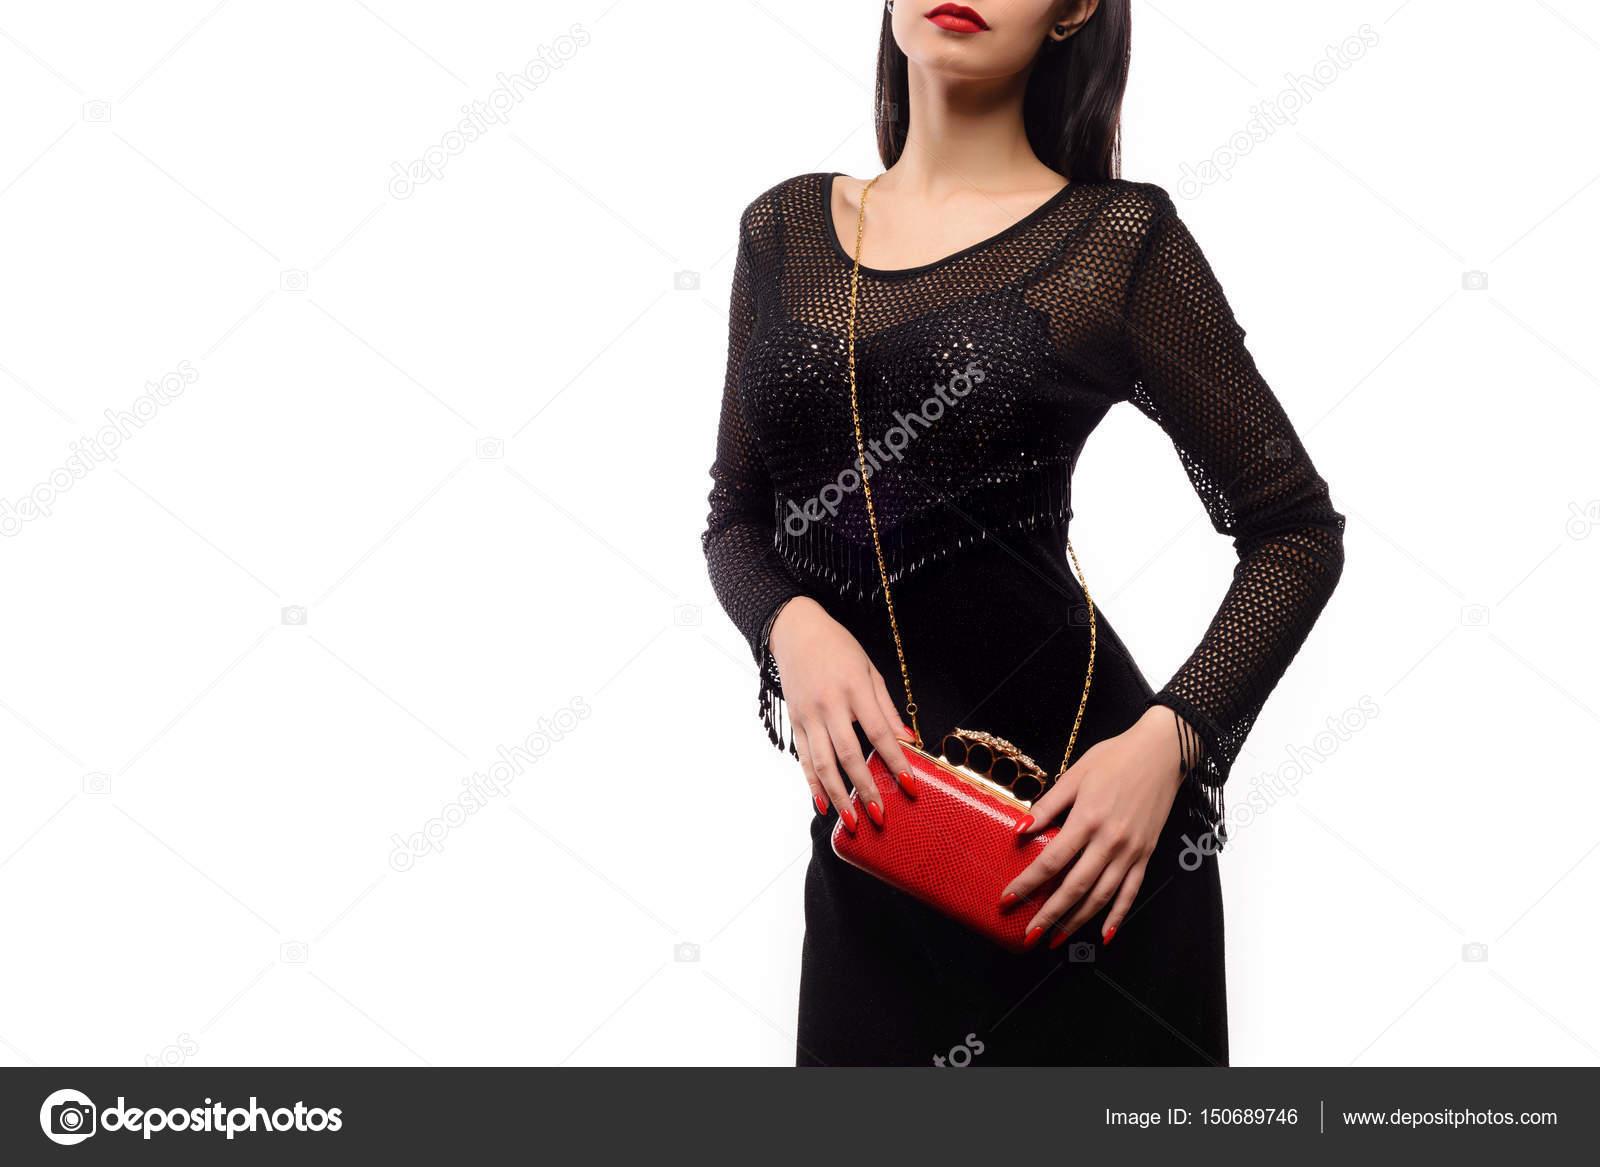 28d7edbfb09d Μοντέρνα ομορφιάς γυναίκα με μια κόκκινη τσάντα και μαύρο βραδινό φόρεμα — Φωτογραφία  Αρχείου